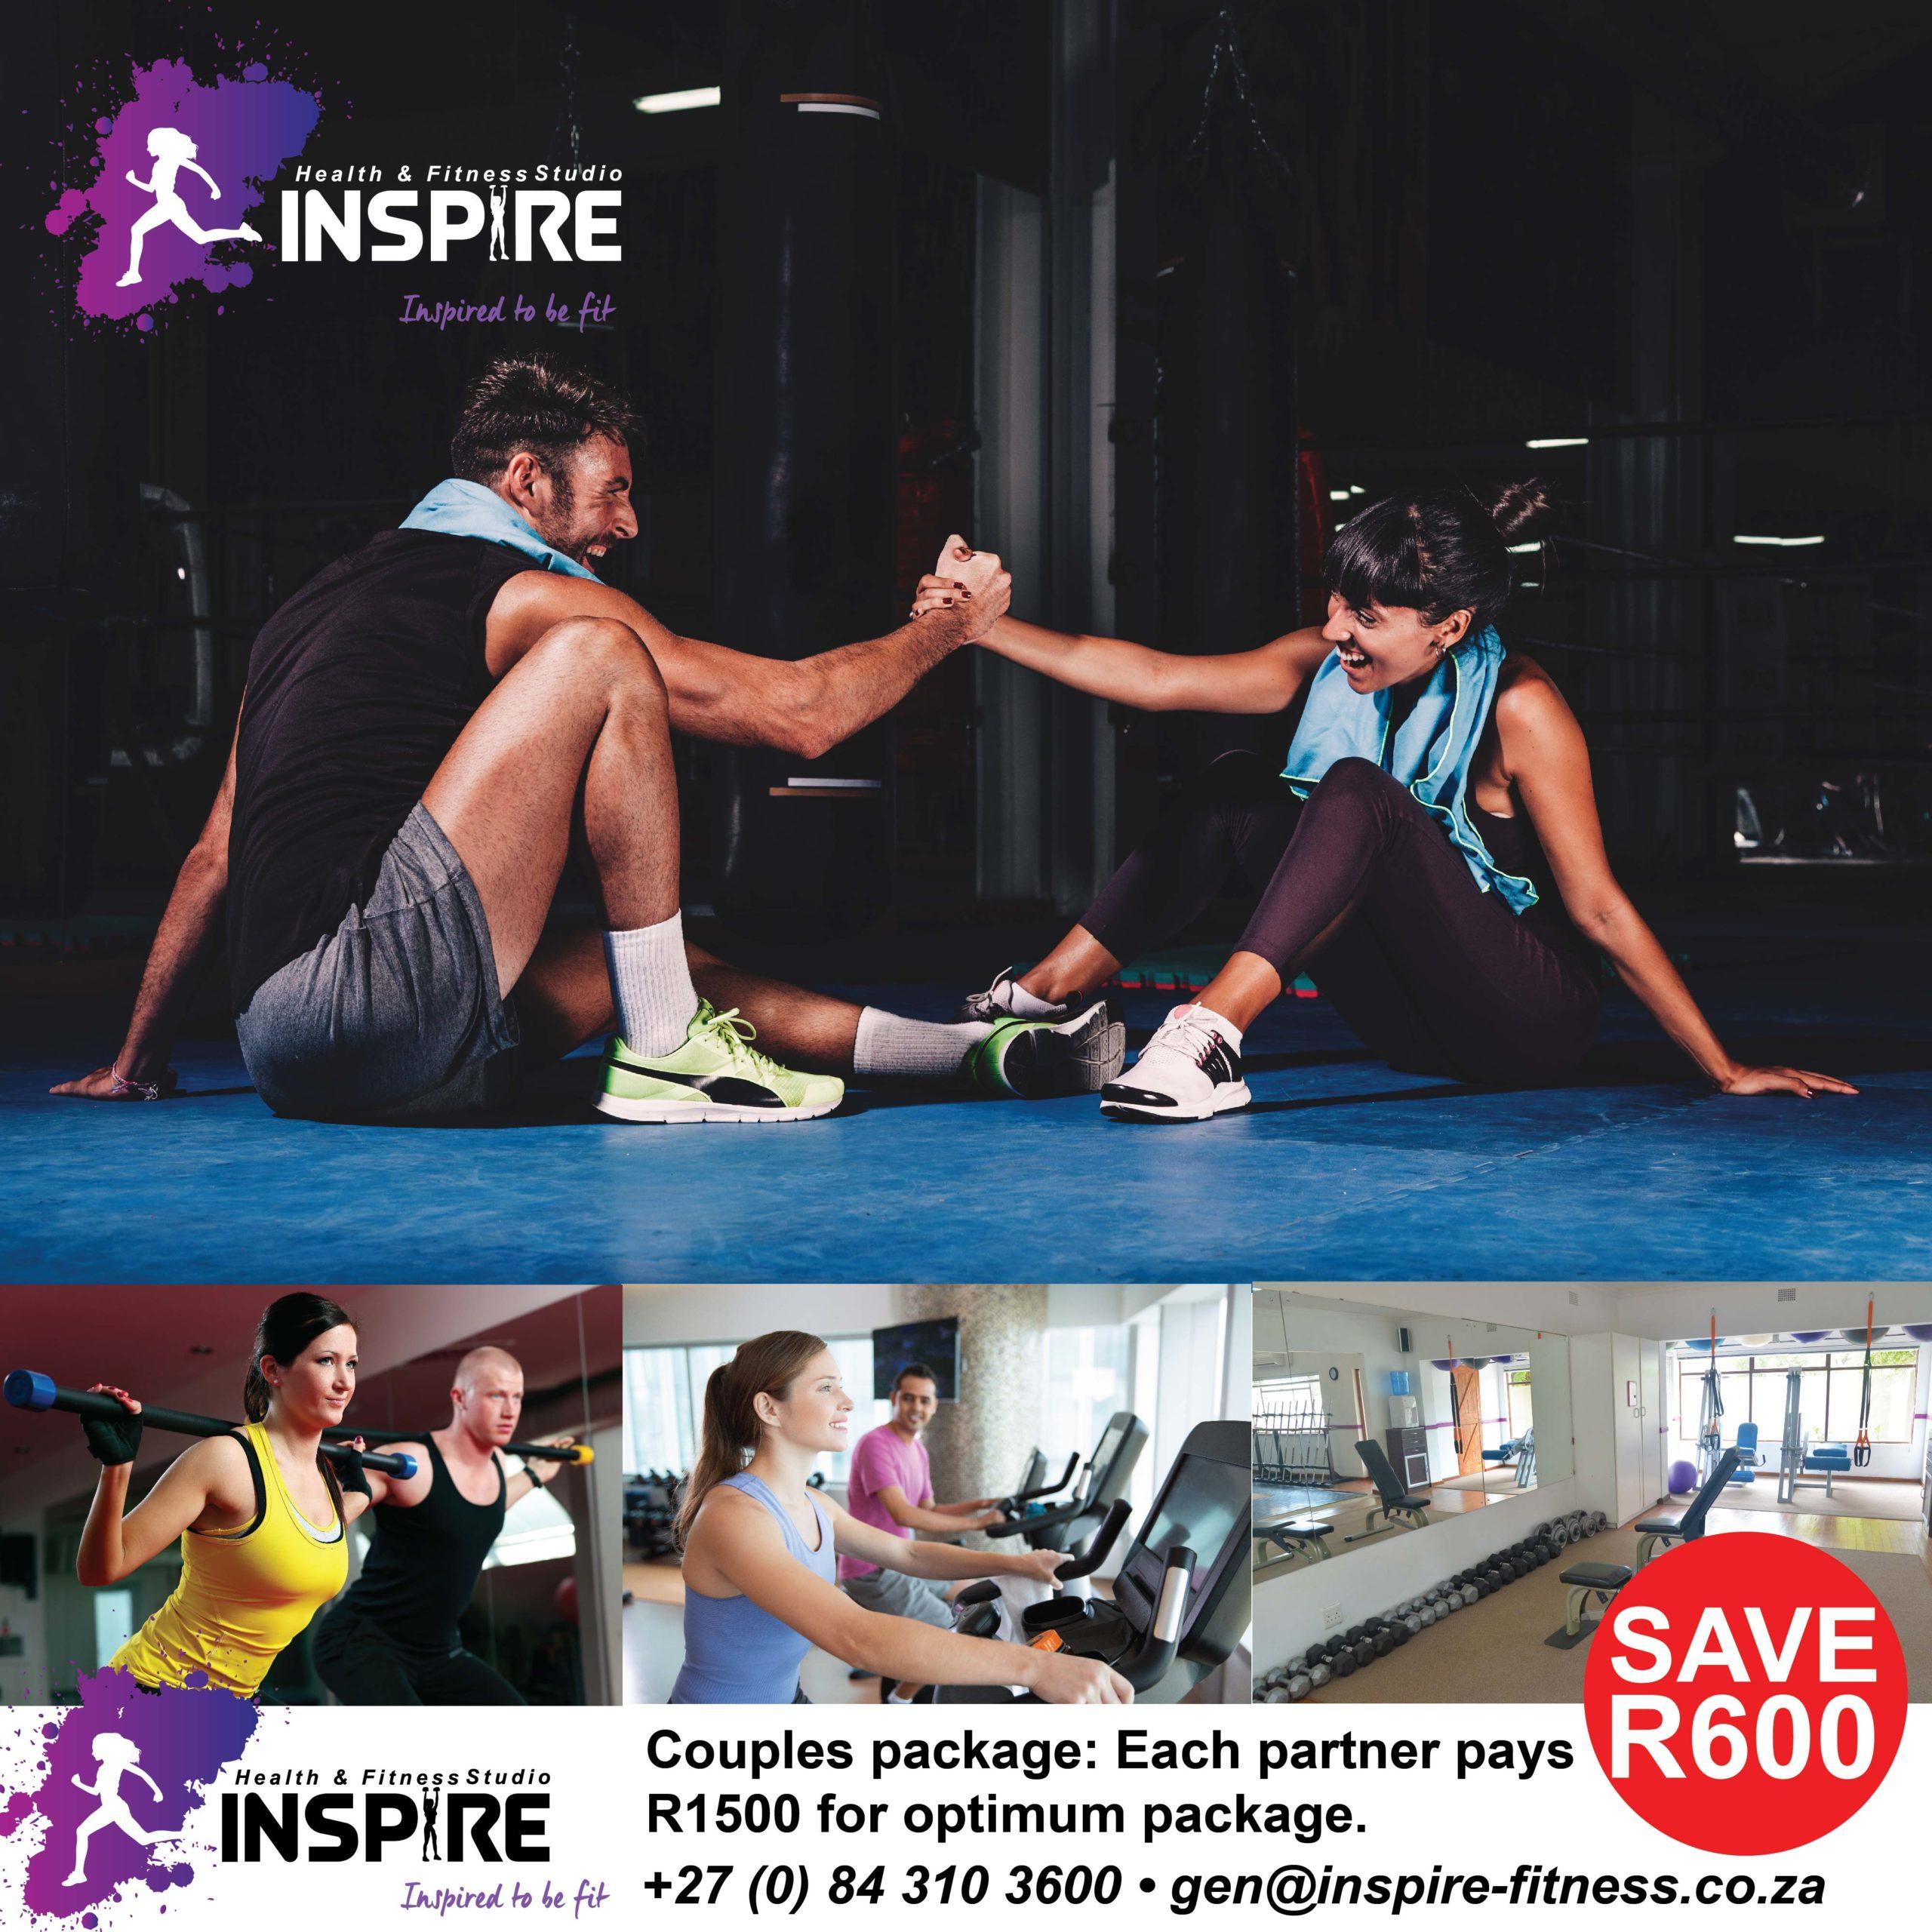 Specials Inspire Fitness www.inspire-fitness.co.za